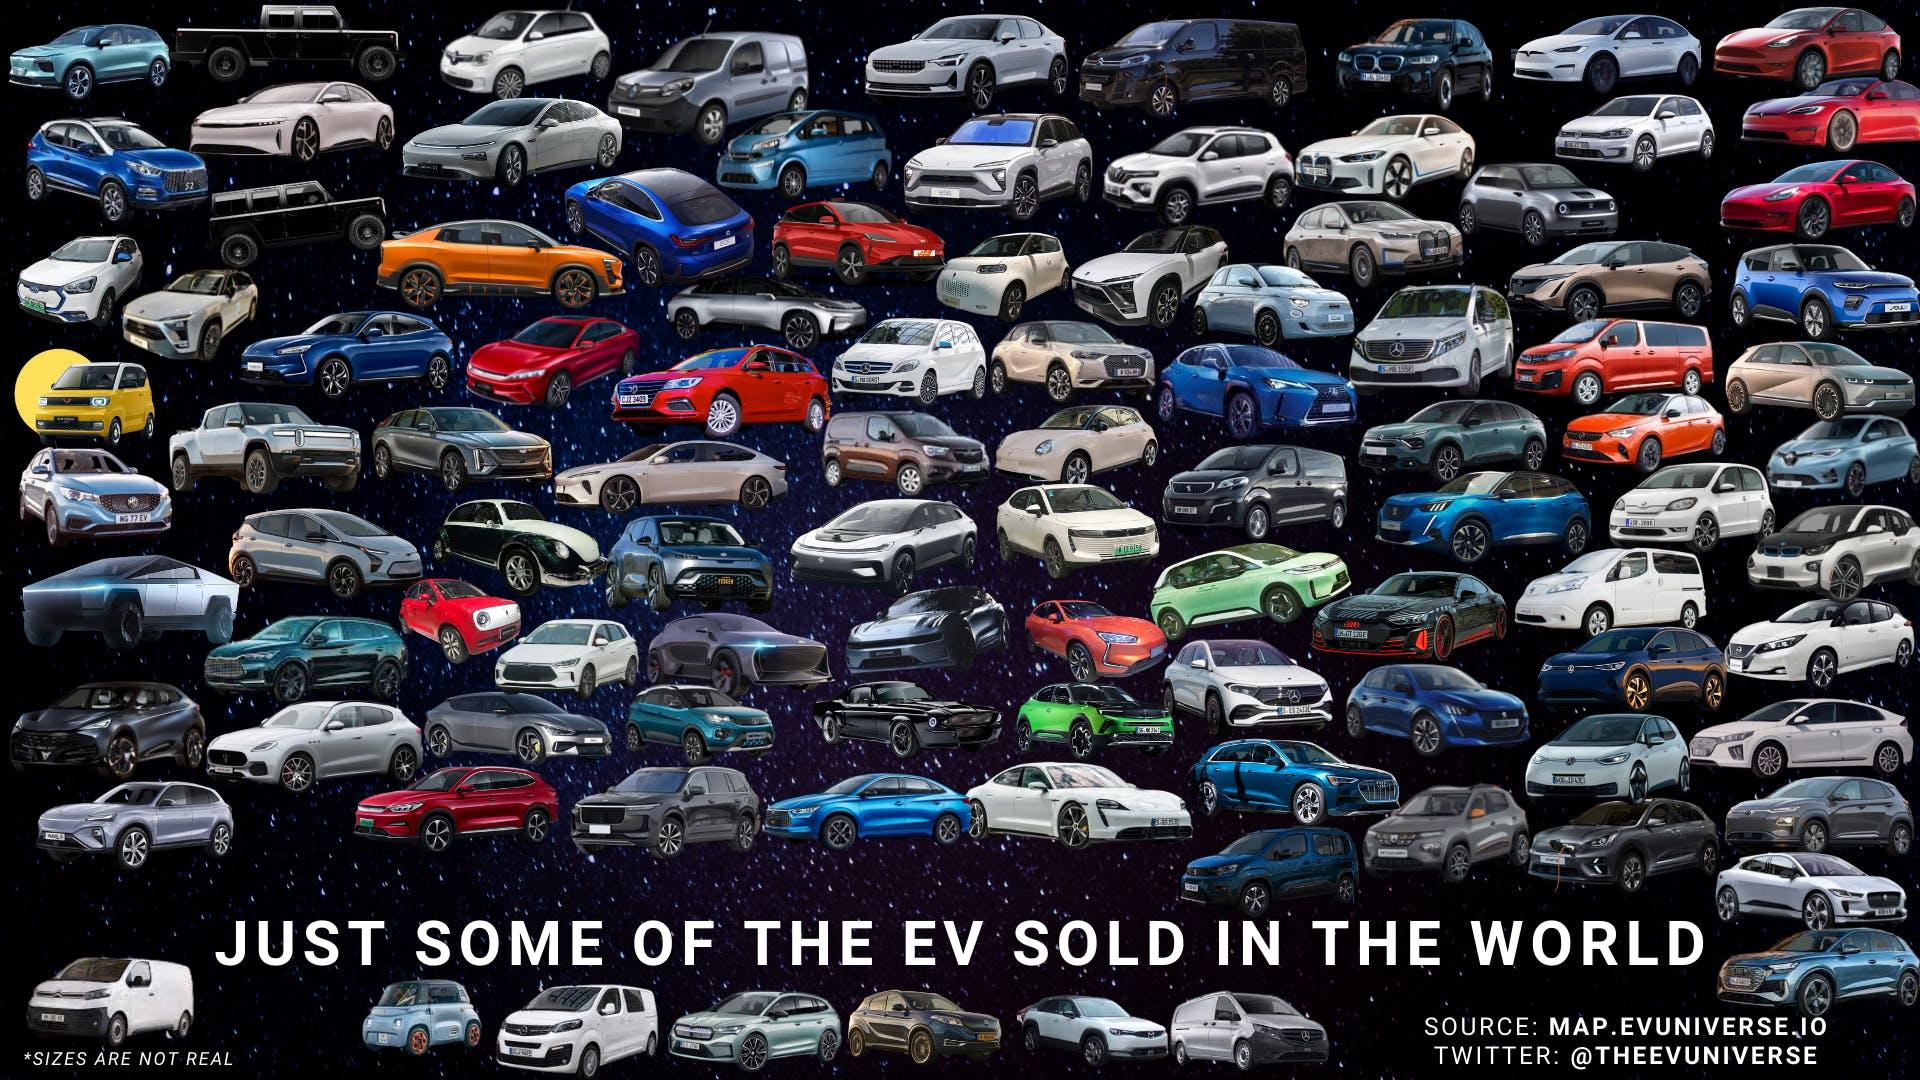 mapping EV models